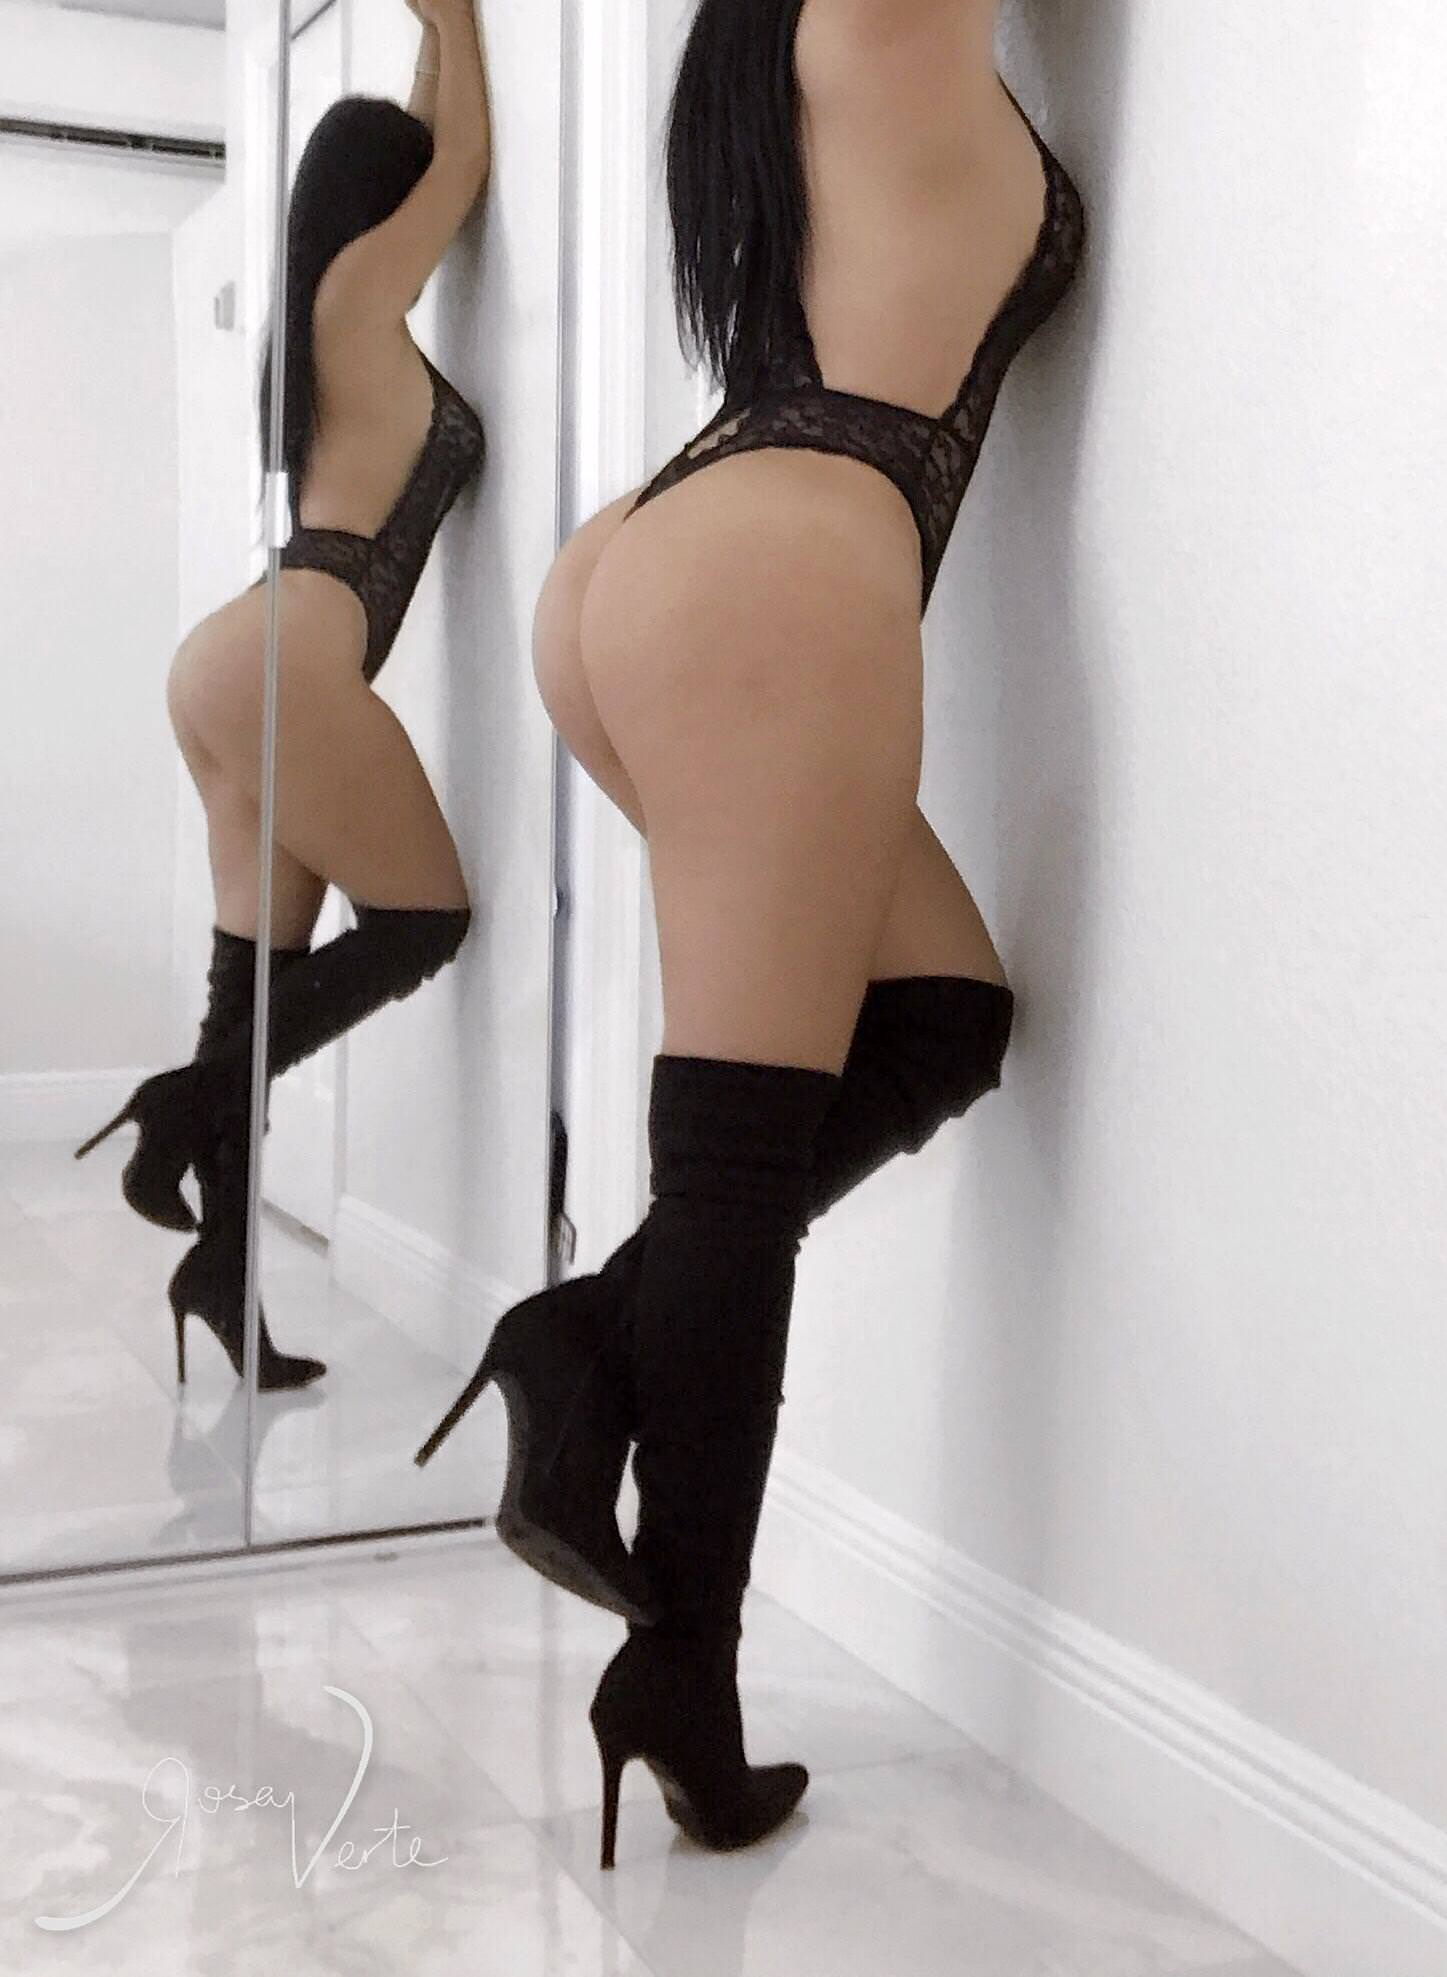 best of High boots thigh